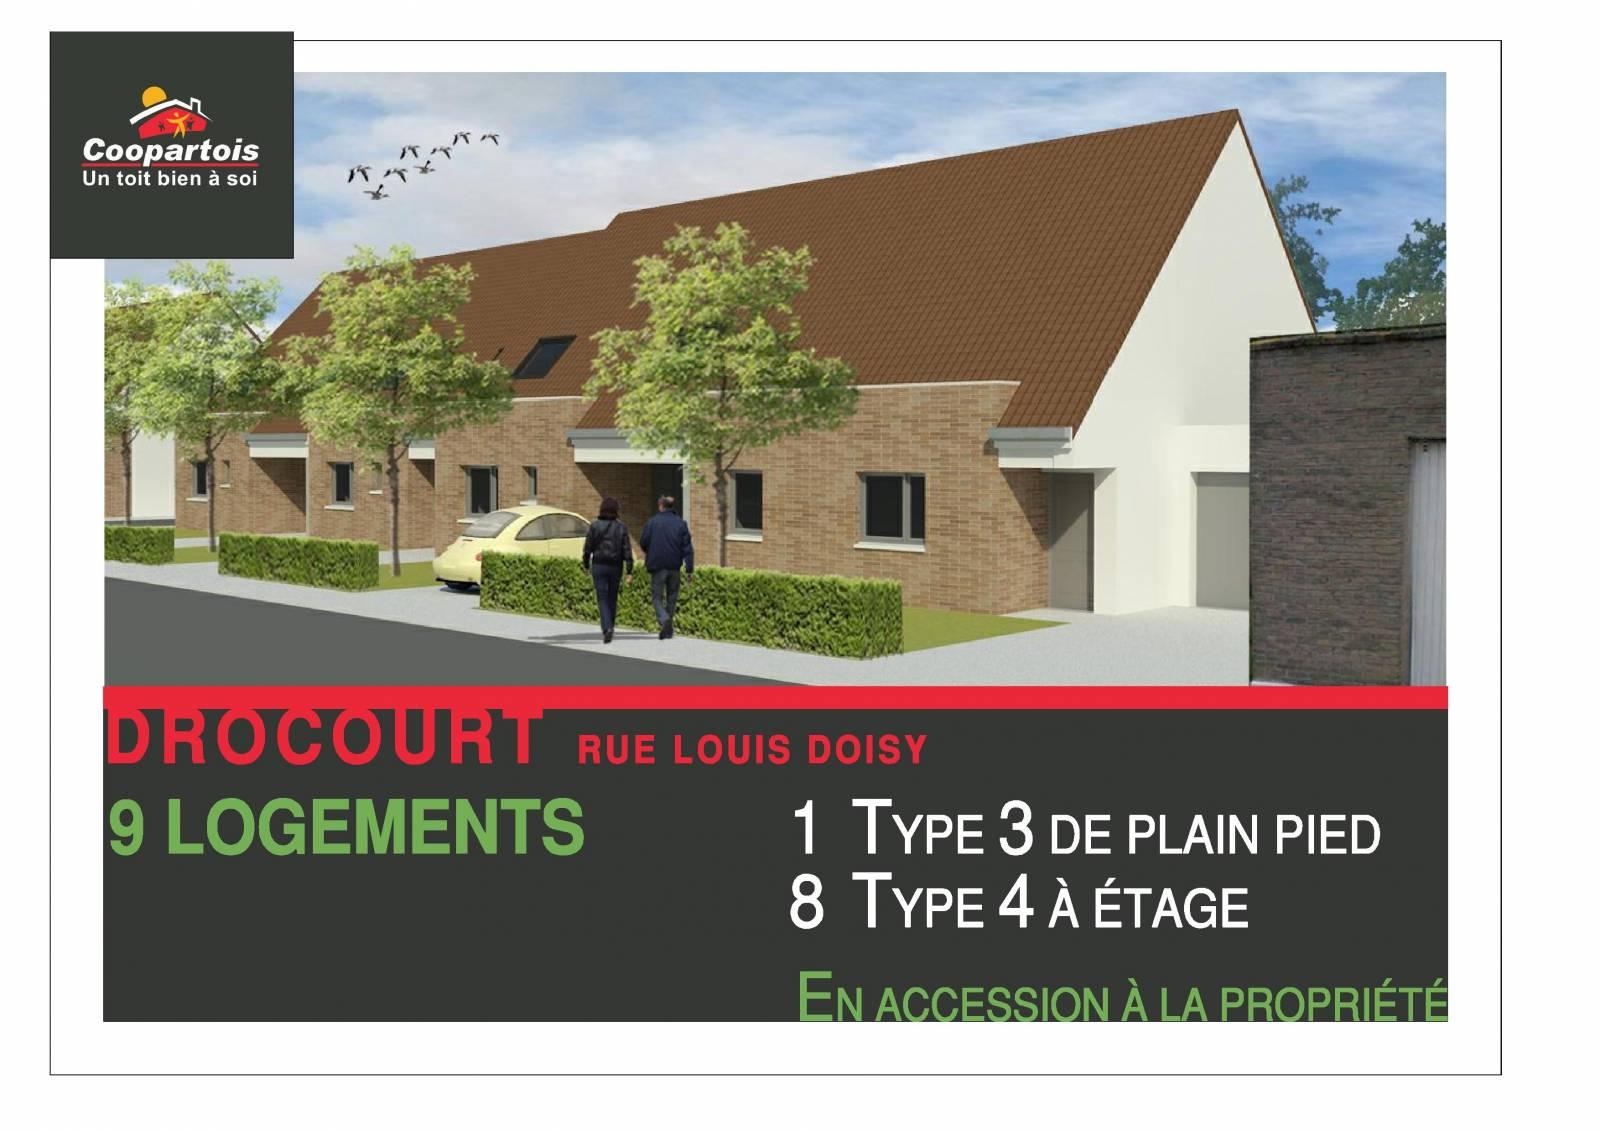 Maison neuve 3 chambres rt 2012 4 coopartois for Prix maison neuve rt 2012